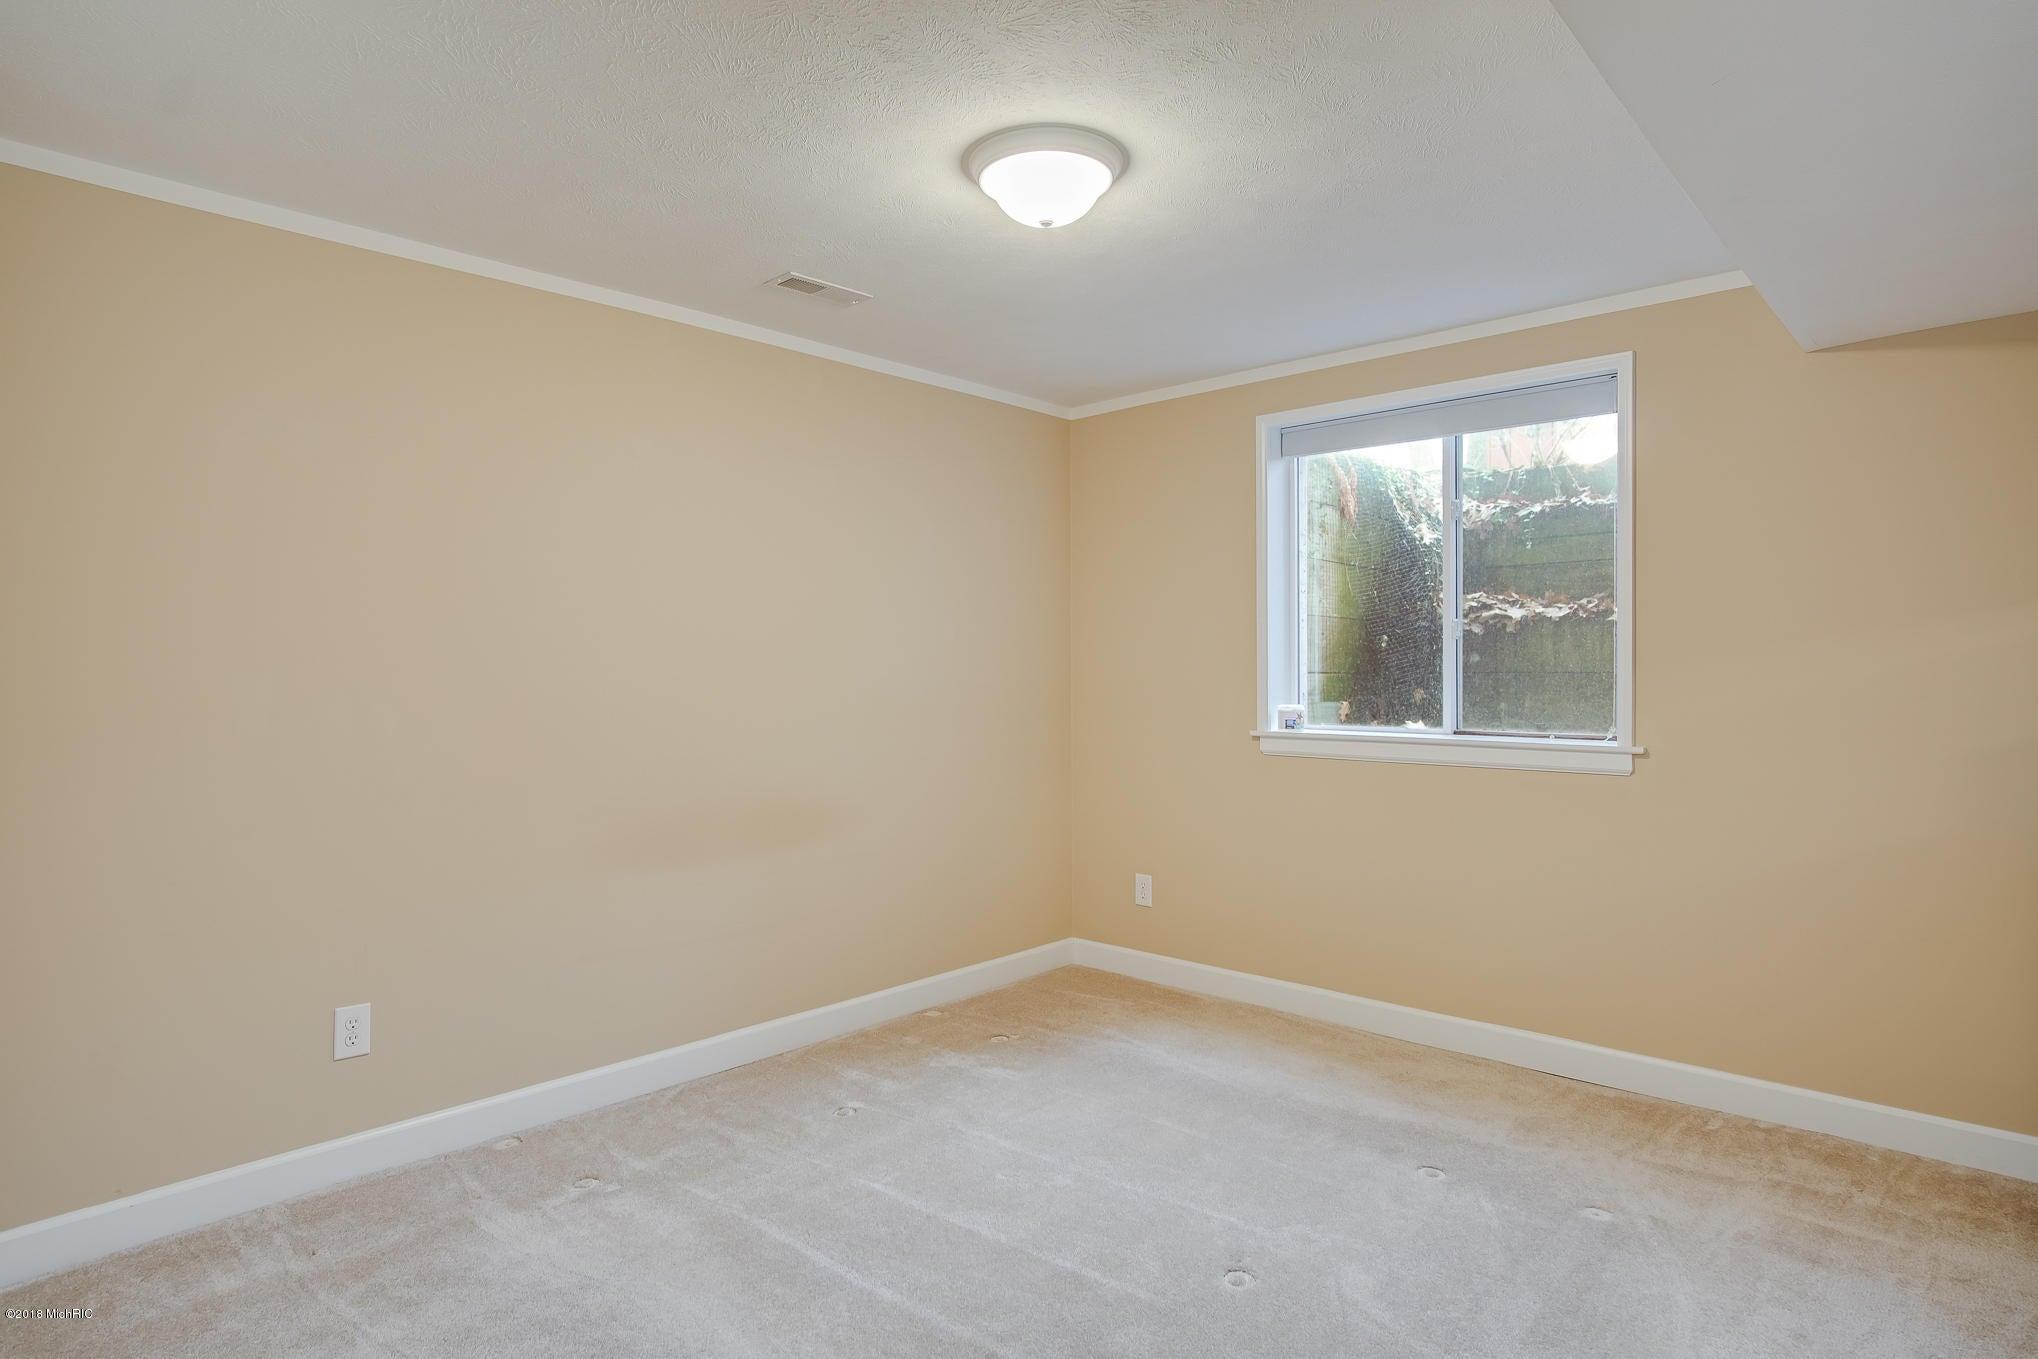 1330 Sycamore Lane, Benton Harbor, MI, 49022, MLS # 17050534 | Jaqua ...